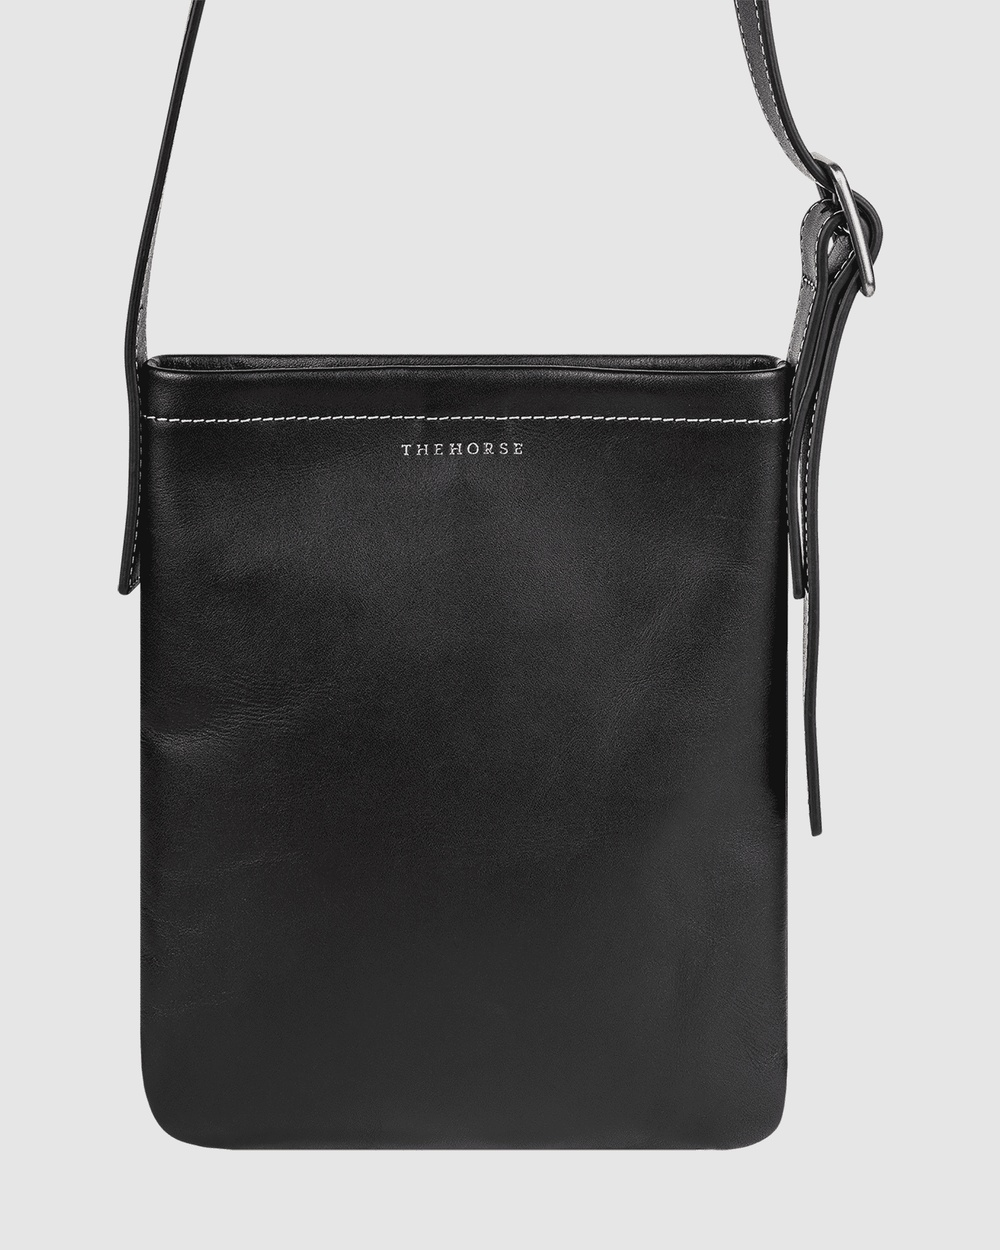 The Horse Eadie Slouch Bags Black Australia